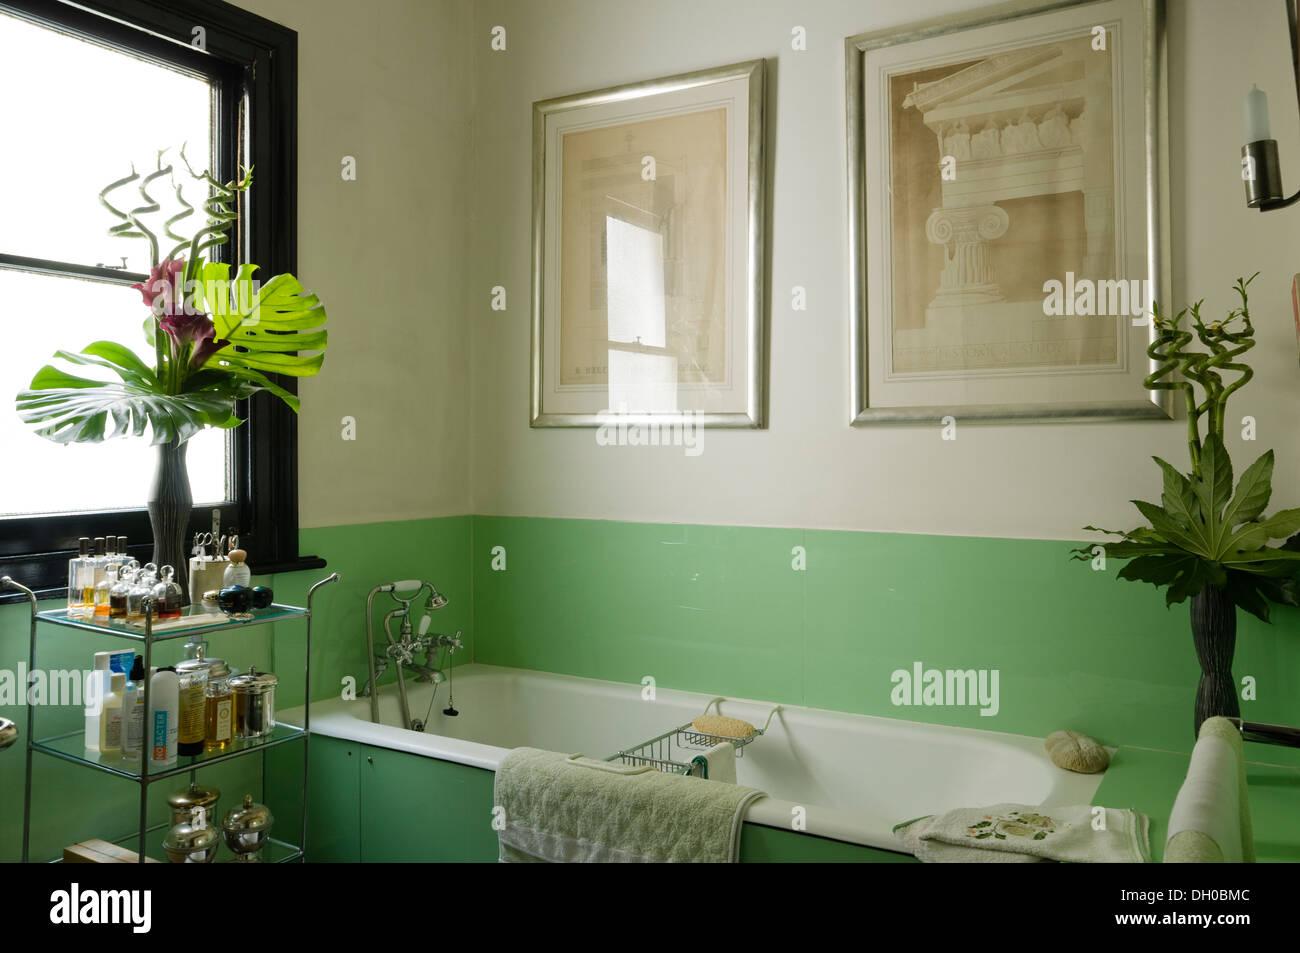 Nice Invalid Baths Frieze - Bathtub Design Ideas - valtak.com